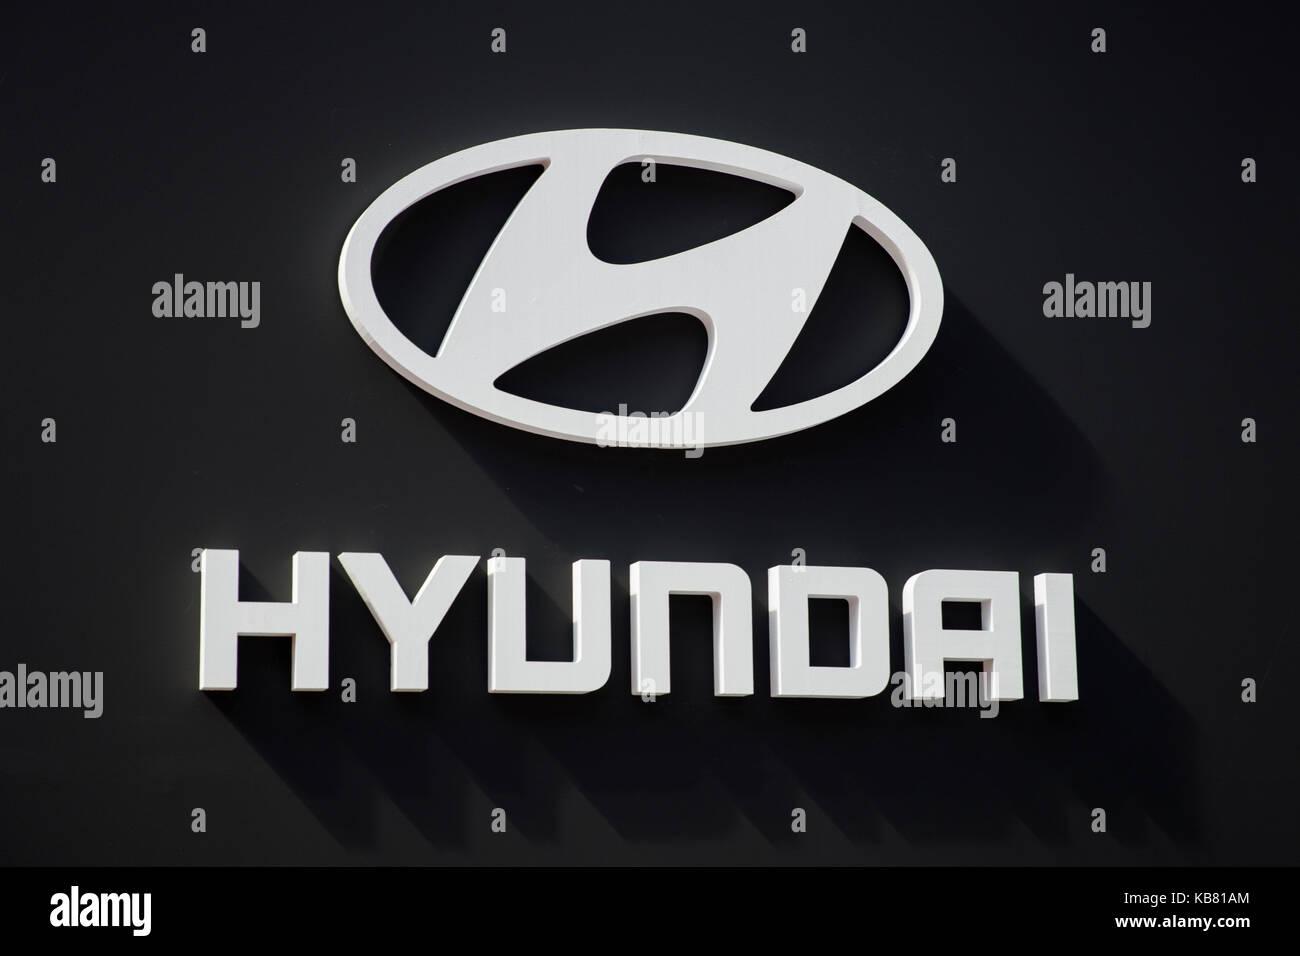 hyundai car logo stock photos amp hyundai car logo stock